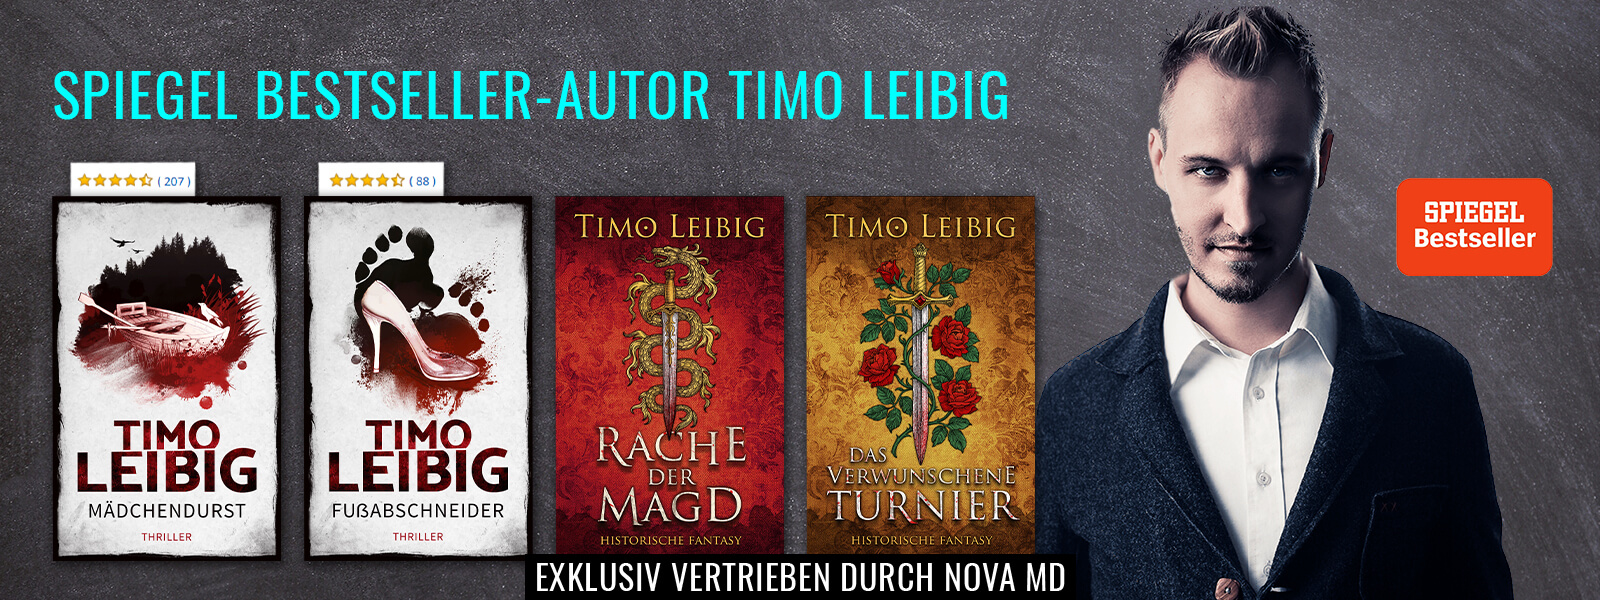 Spiegel-Bestseller-Autor Timo Leibig